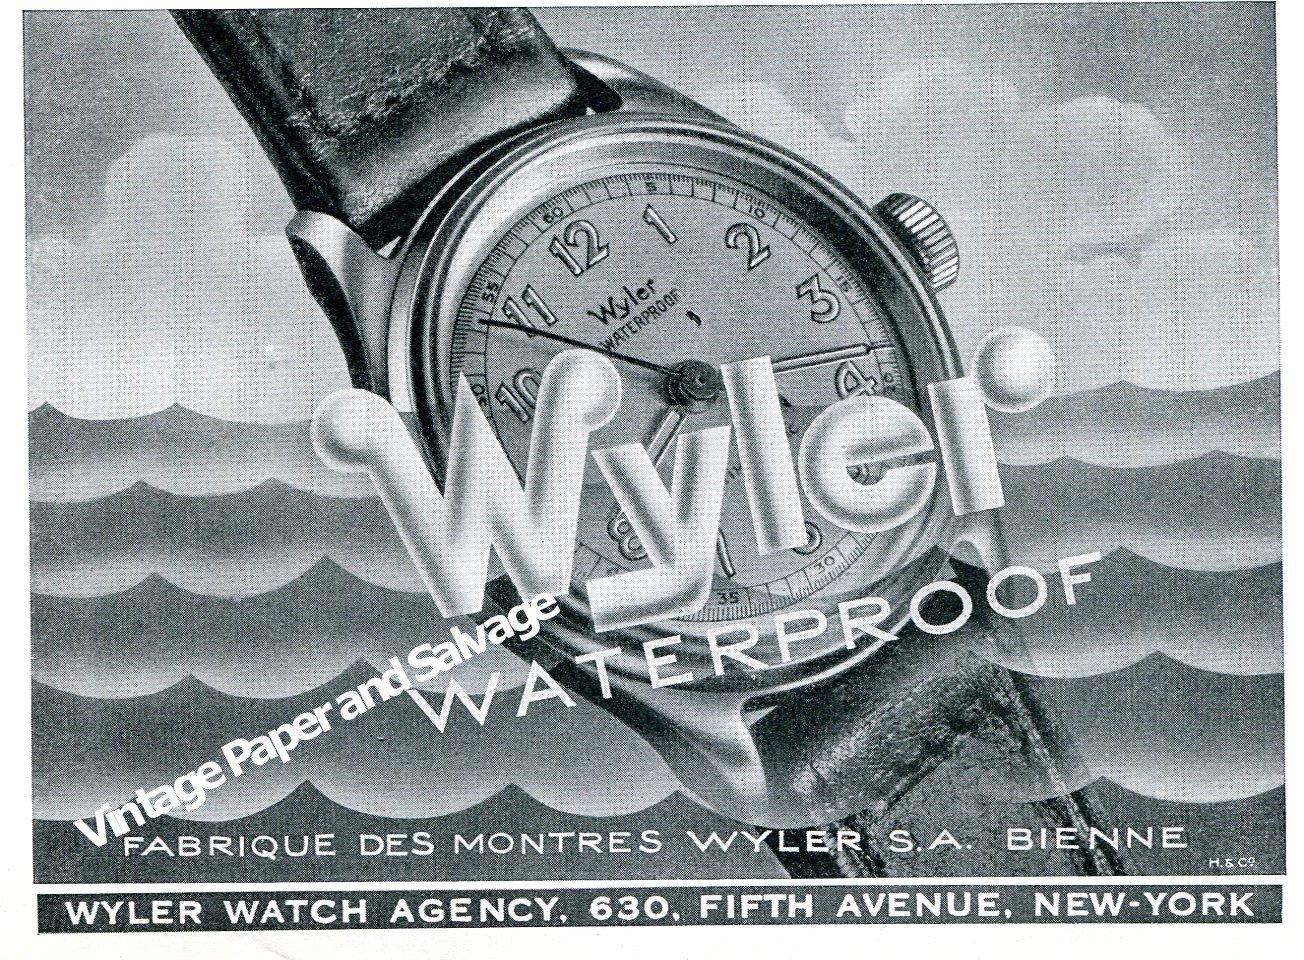 Vintage 1944 Wyler Watch Company Switzerland 1940s Swiss Print Ad Advert Suisse Schweiz